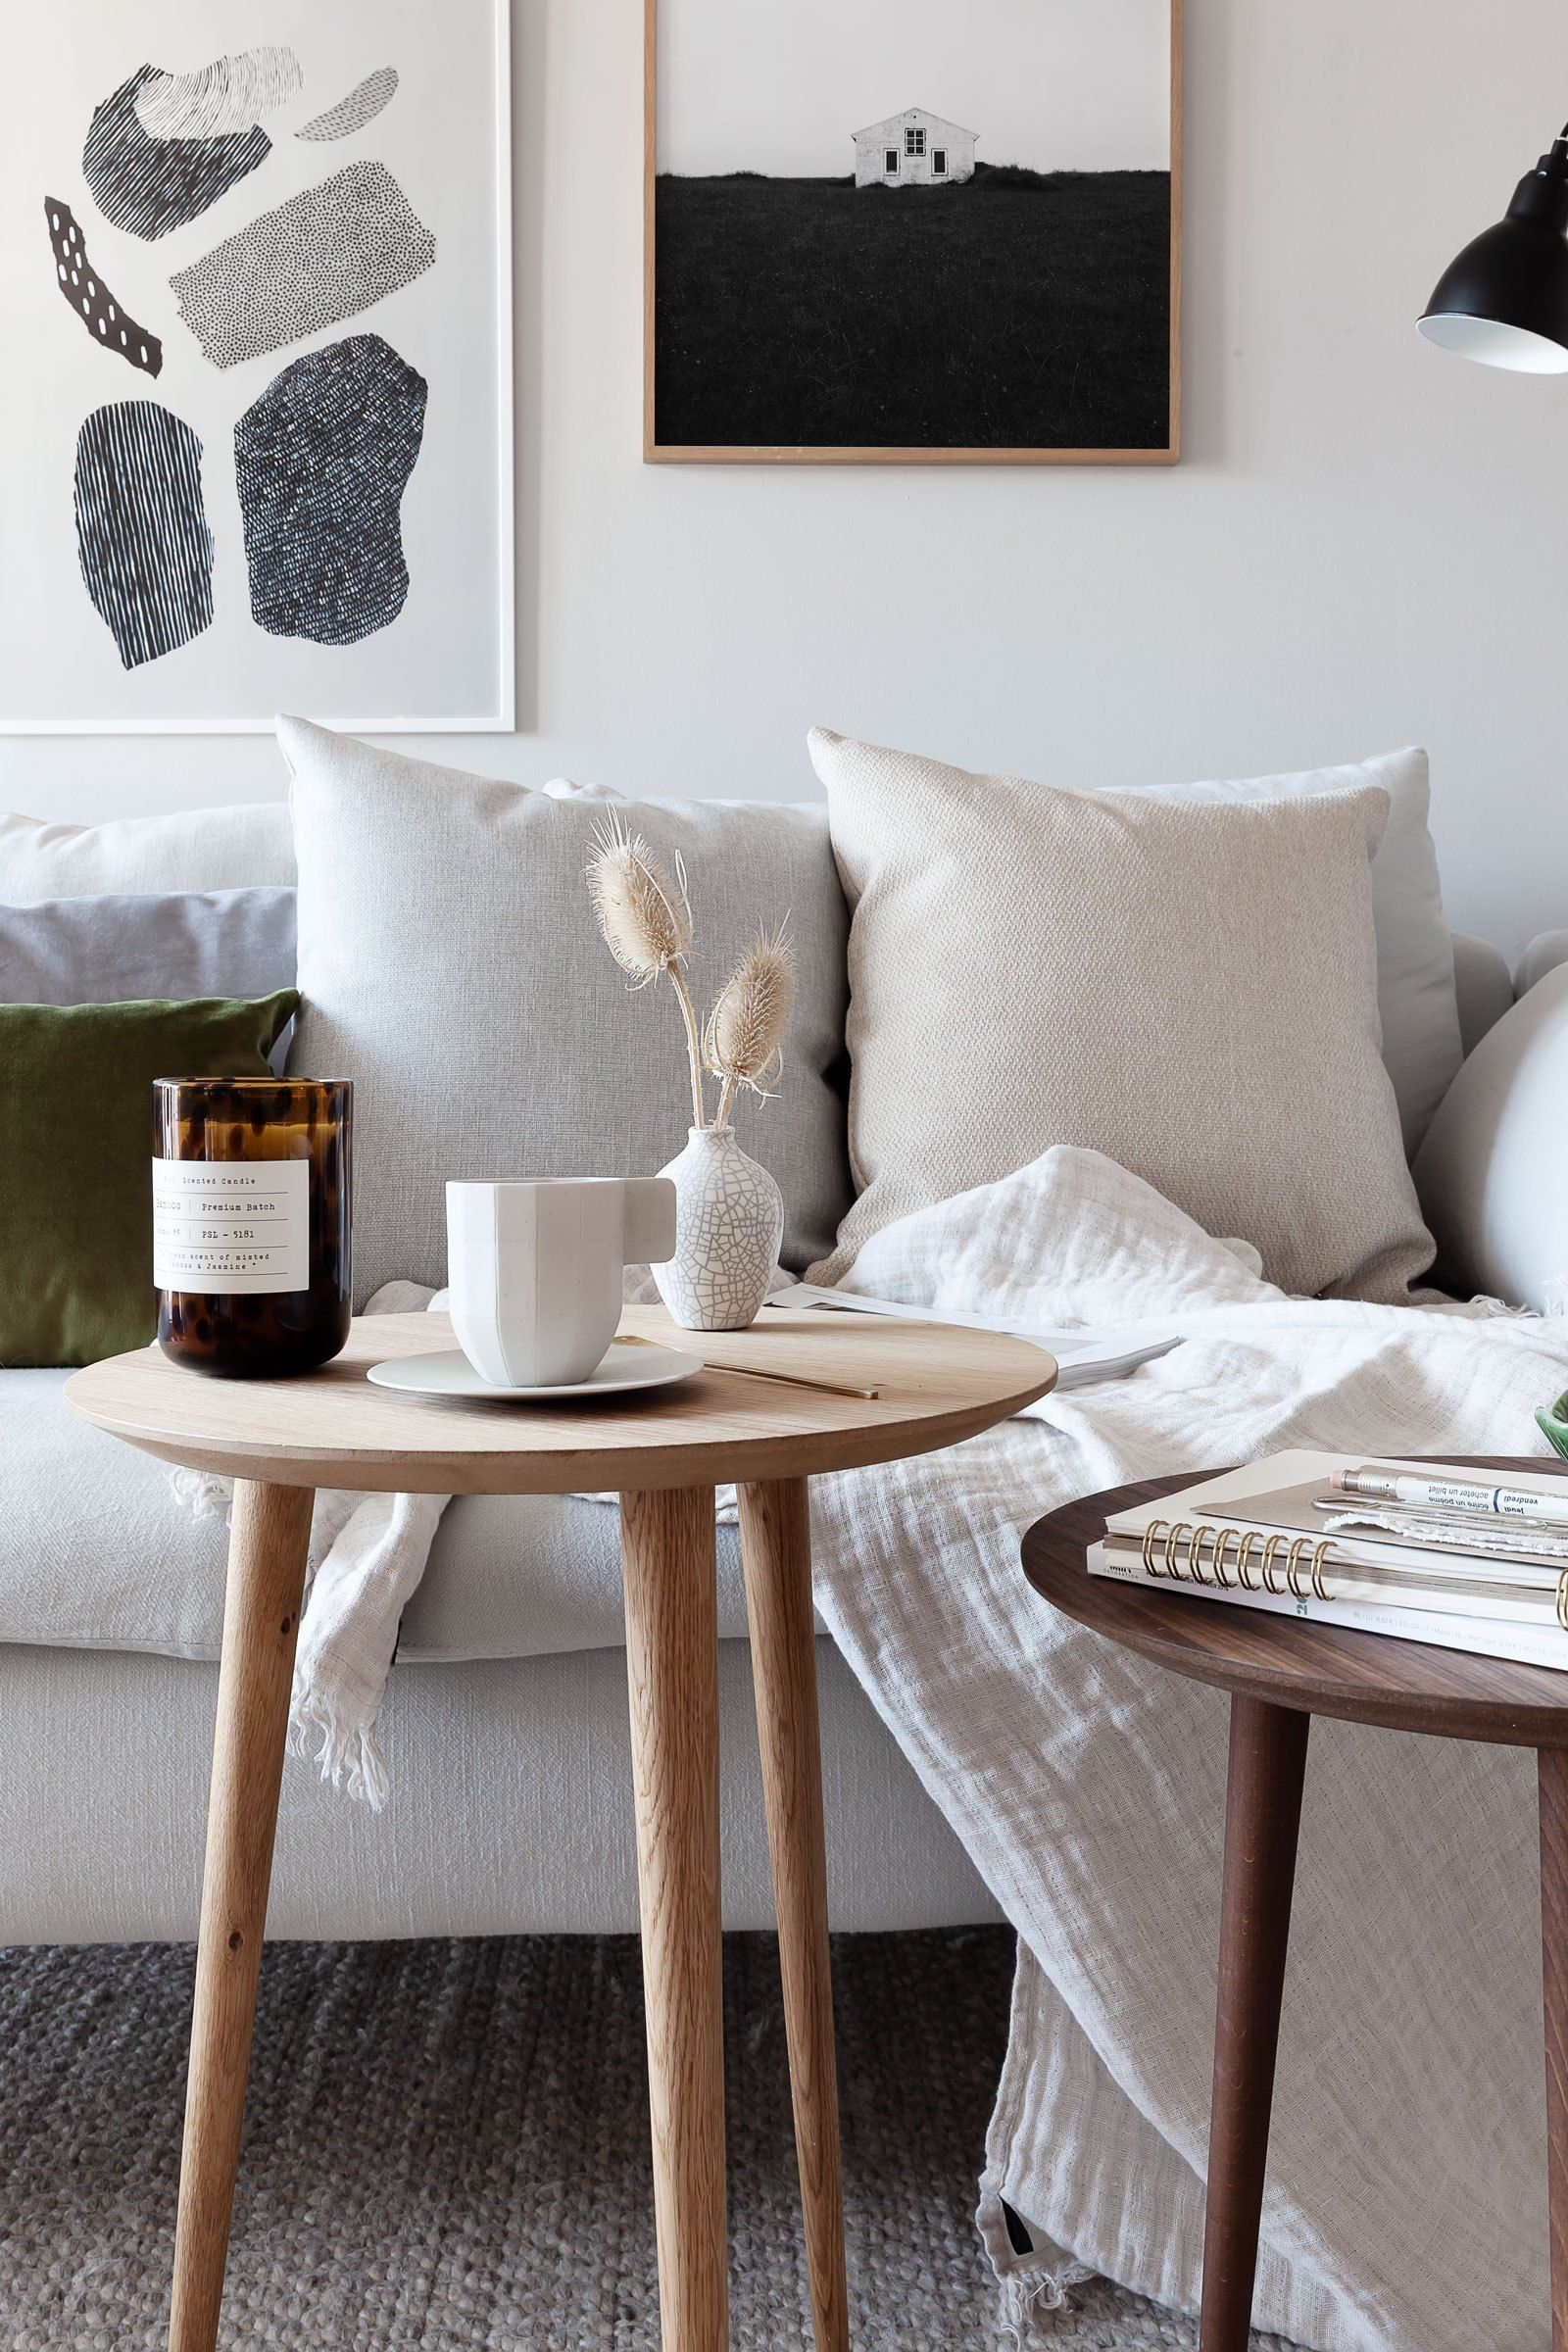 Living Room Update With Mycs Via Coco Lapine Design Blog